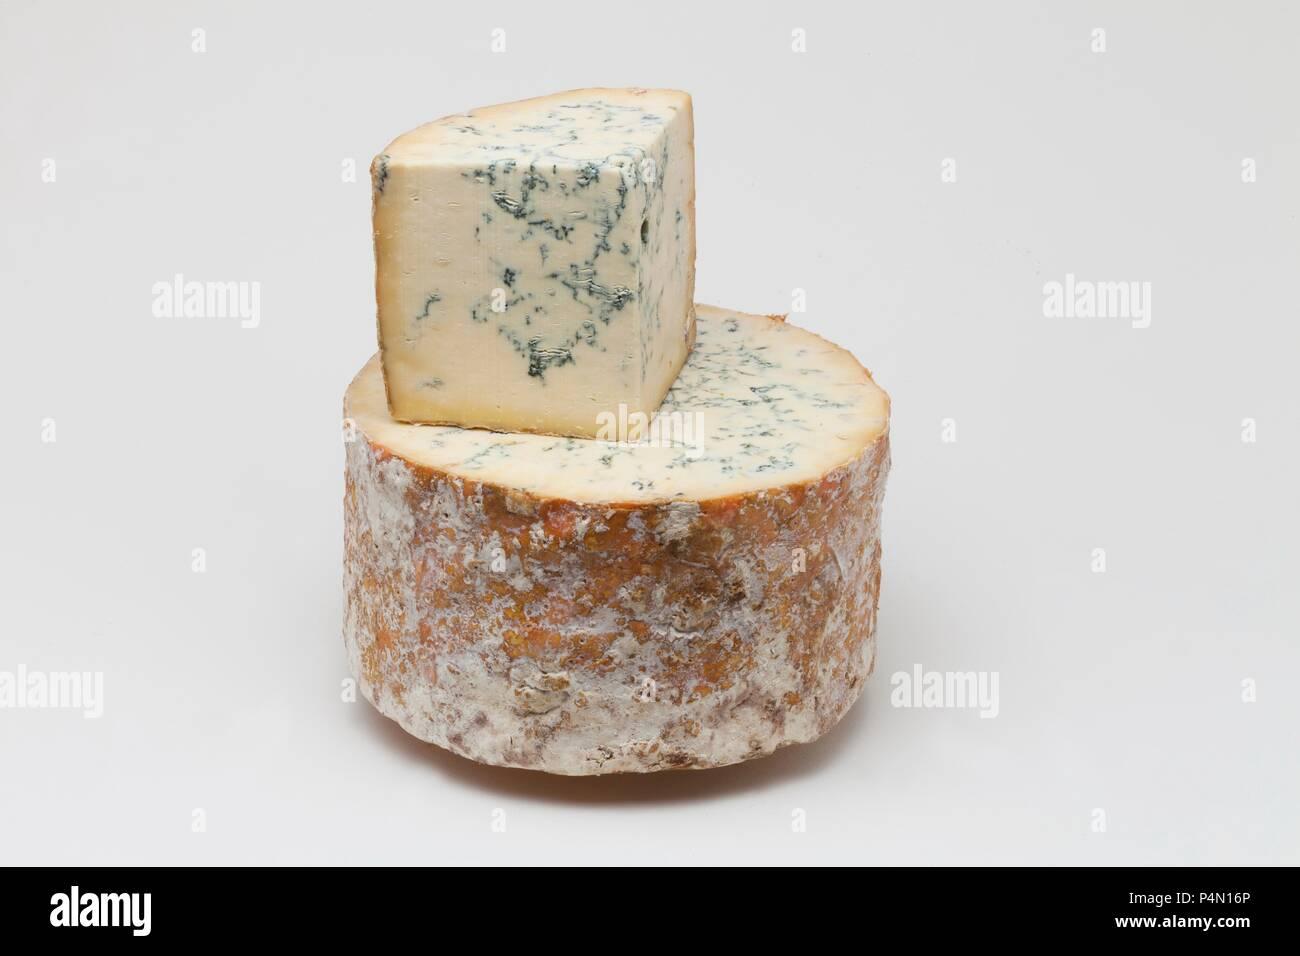 Stilton (blue cheese, Great Britain) - Stock Image